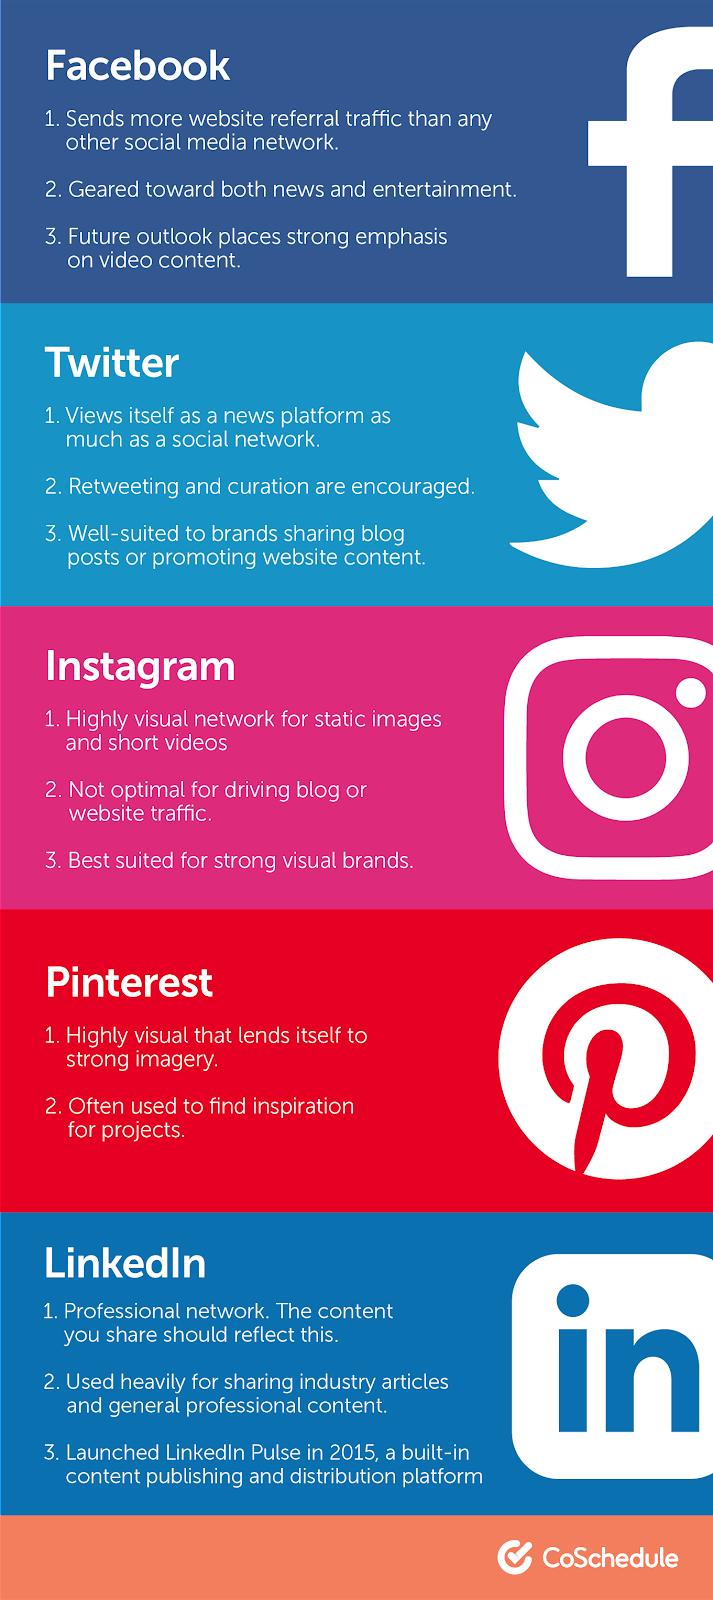 Post On Social Media accounts